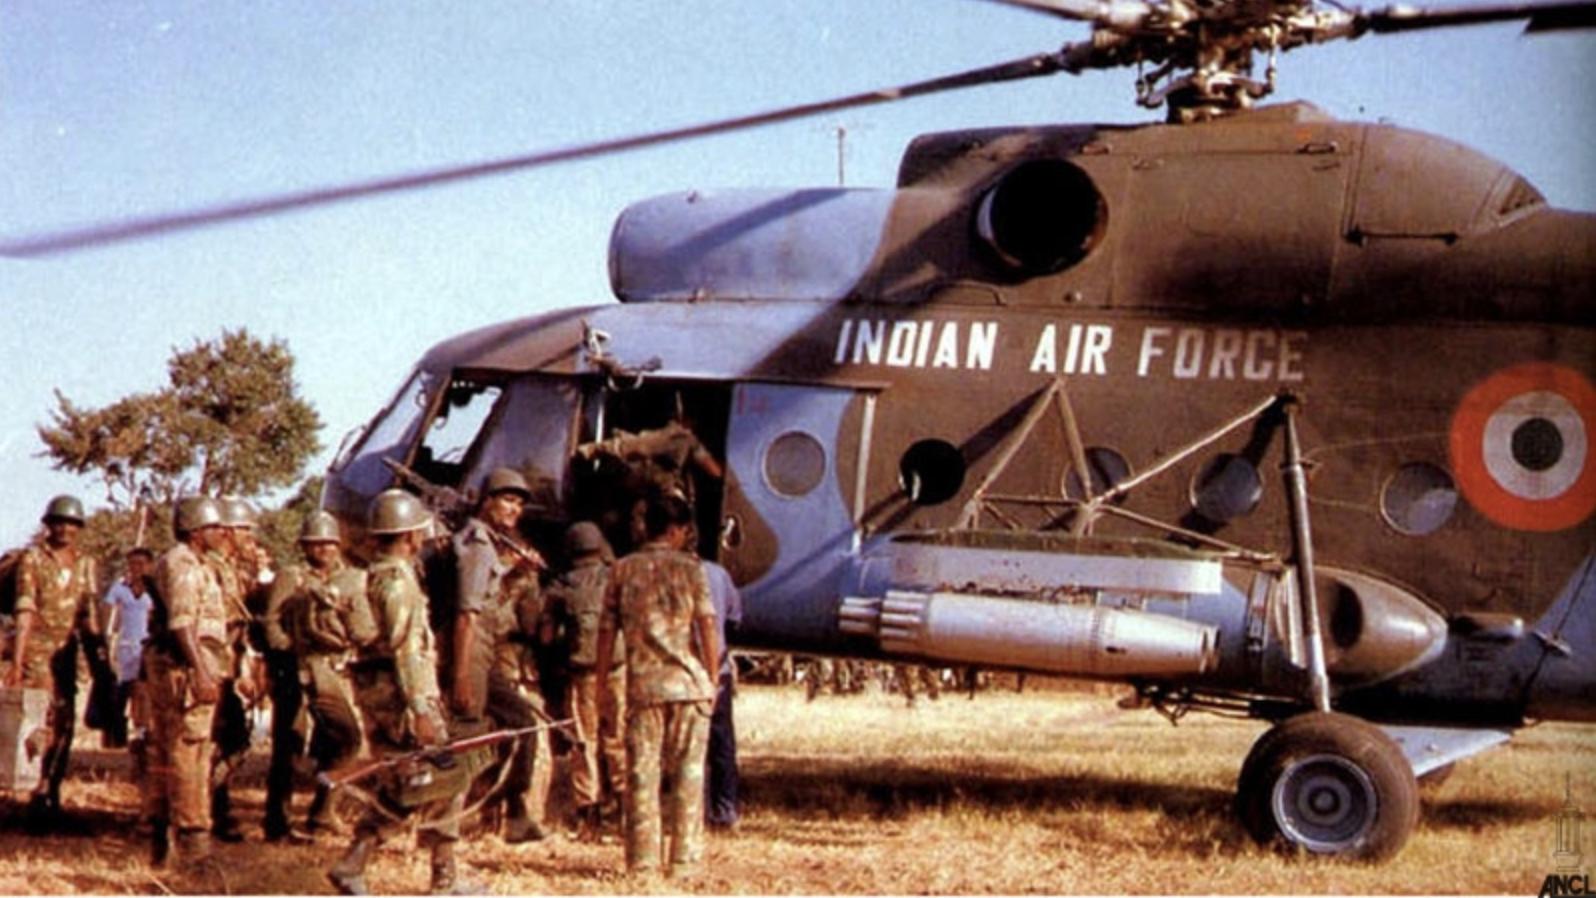 Part 3: Lessons IPKF Debacle Sri Lanka-A Foray without Hope